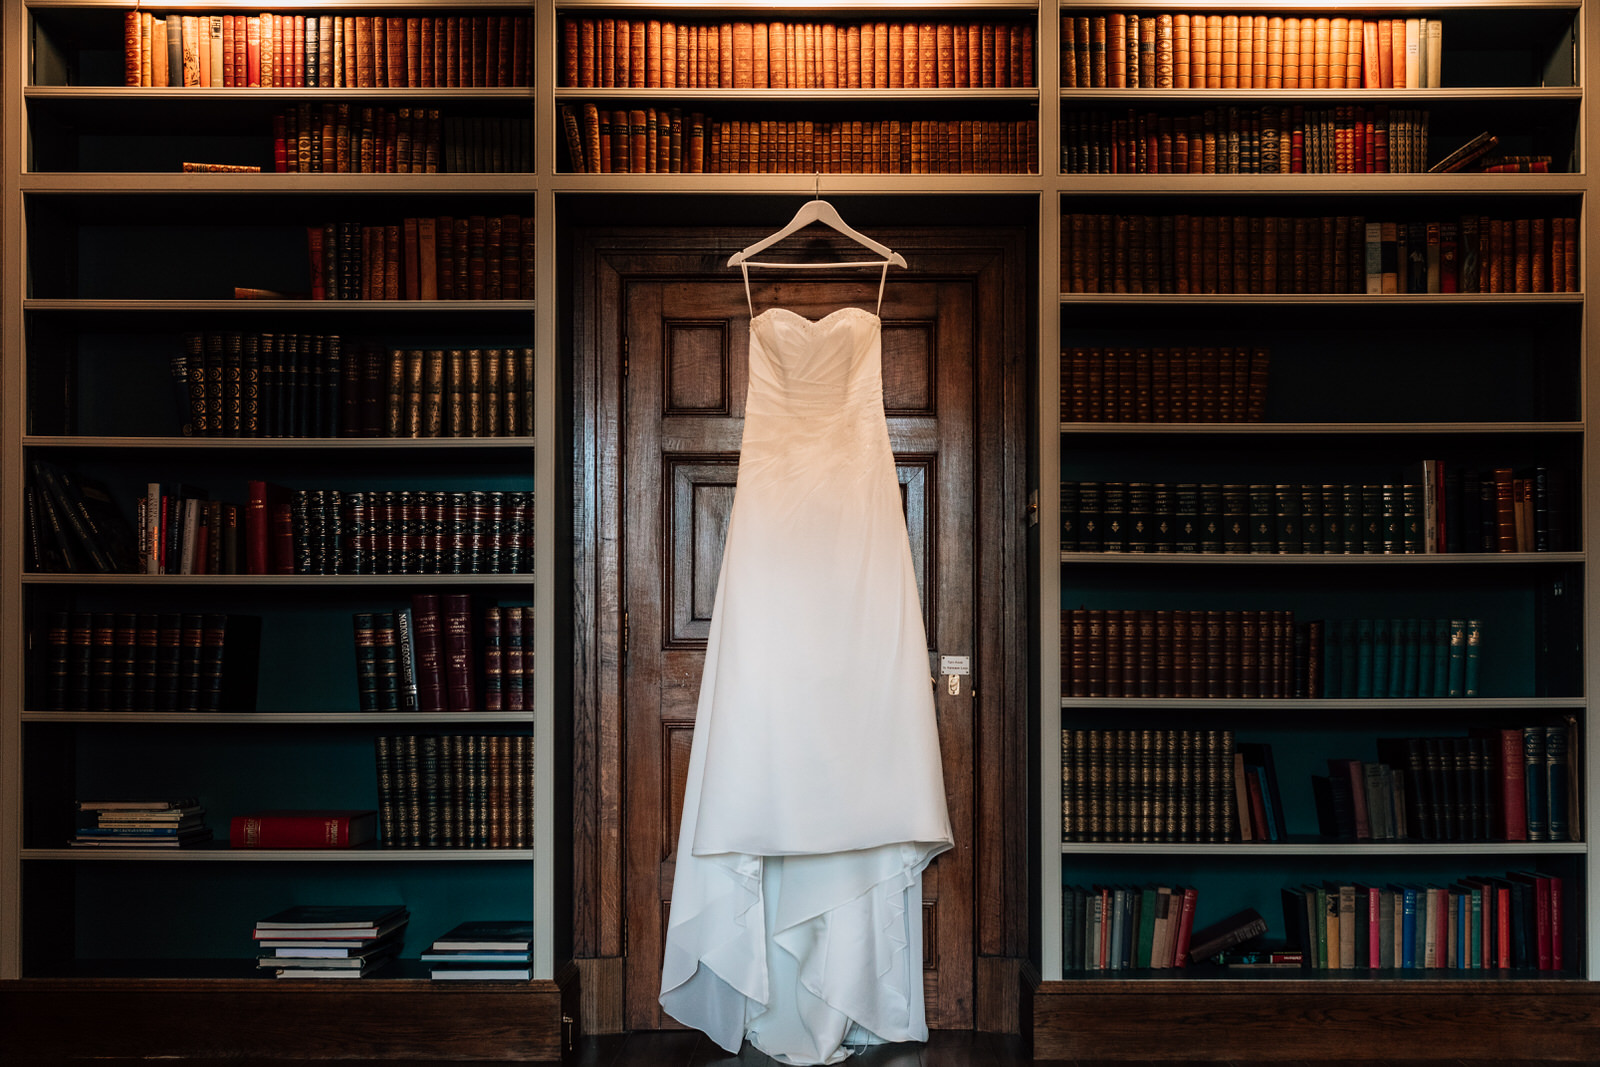 wedding dress hanging against book case